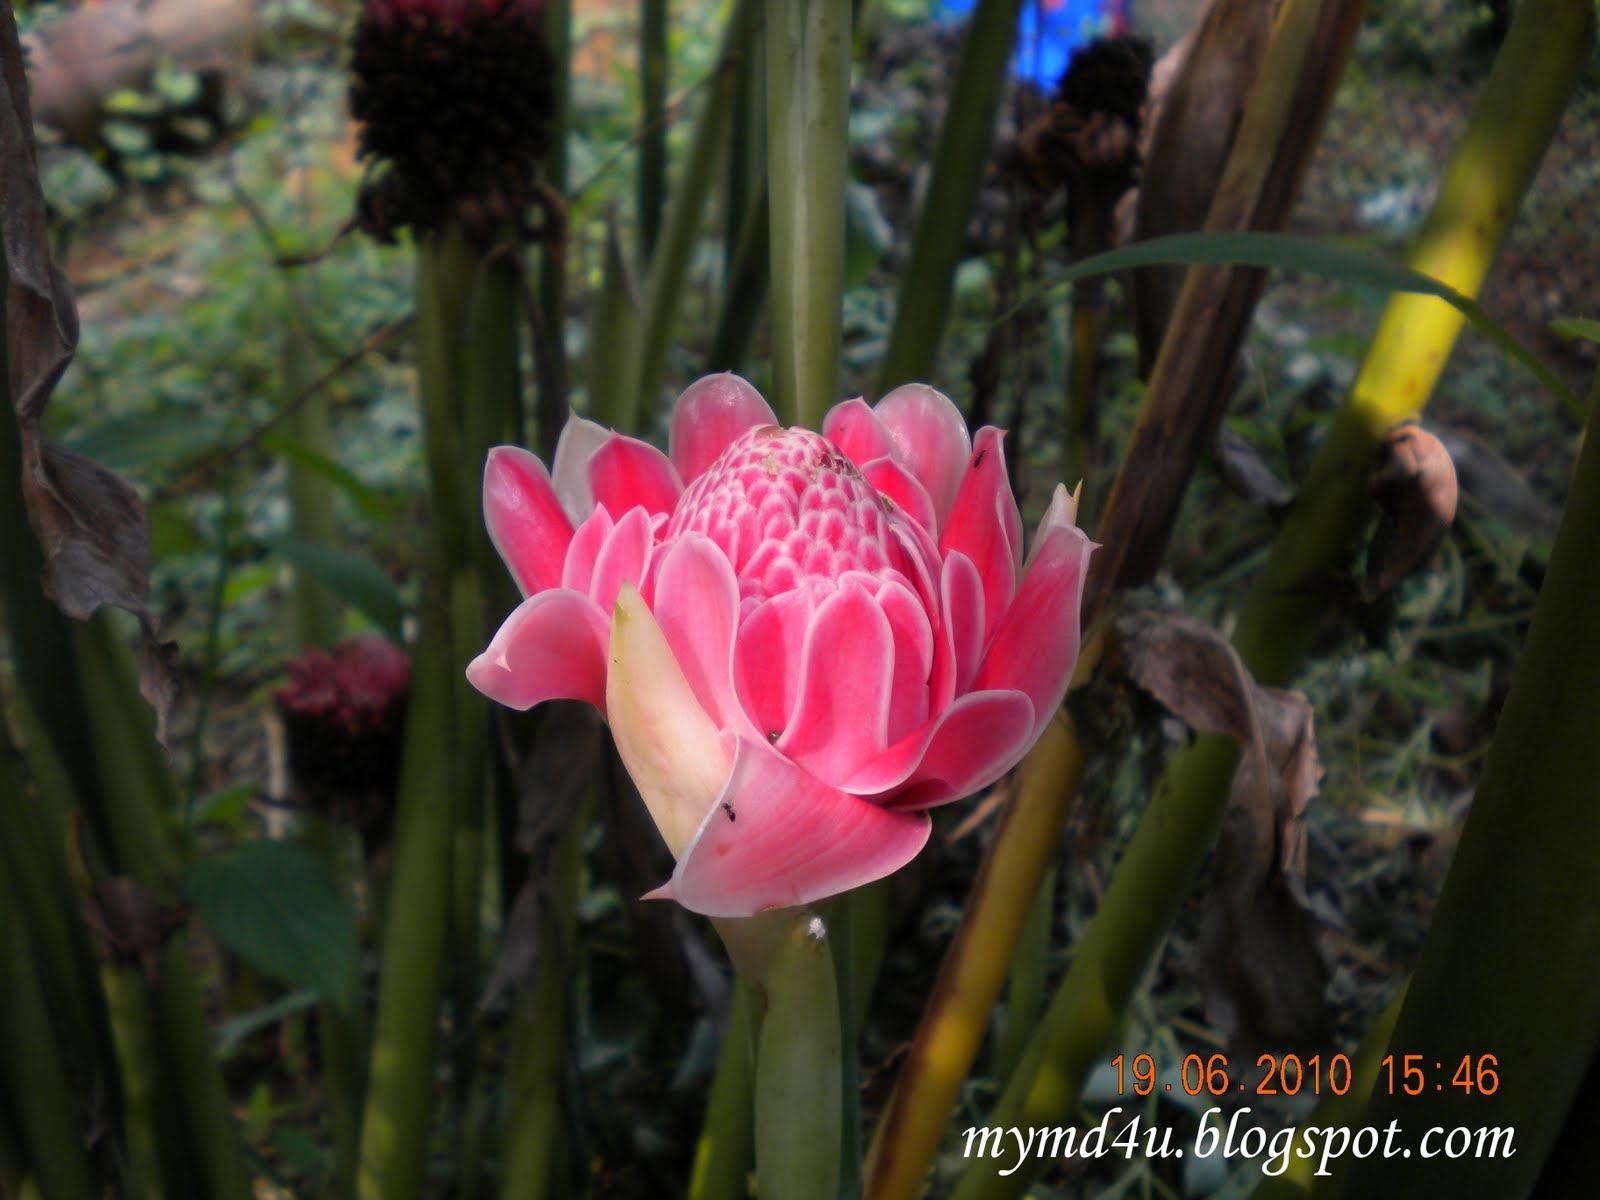 Bunga Kantan - Cantik Dimata,Enak Dimakan.